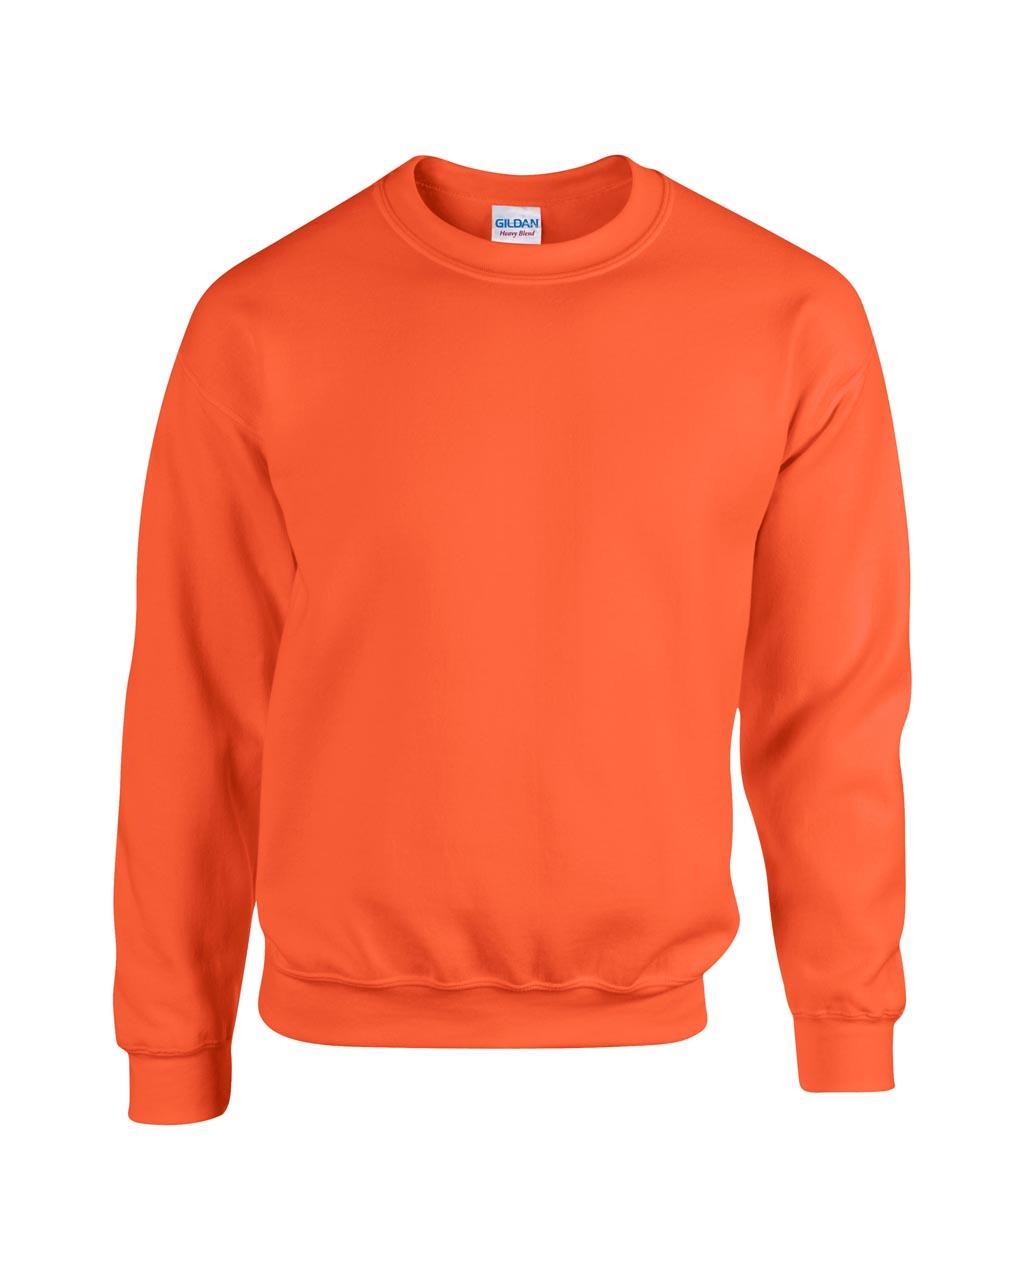 Gildan Sweatshirt narančasta